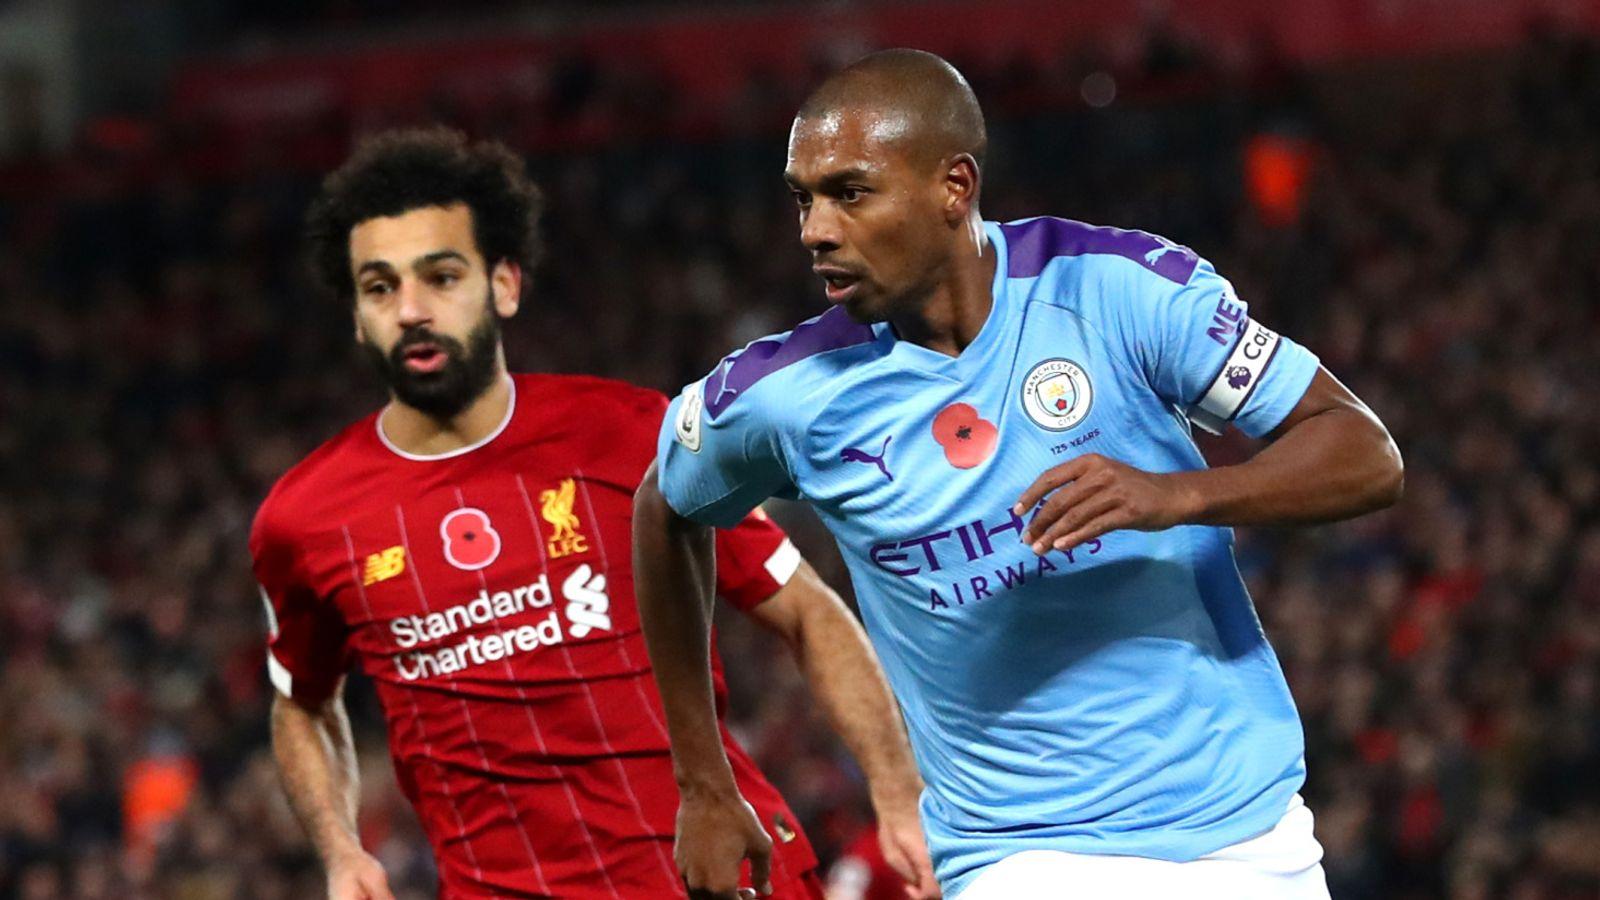 Man City Vs Liverpool Should Be Played At Etihad Say Spirit Of